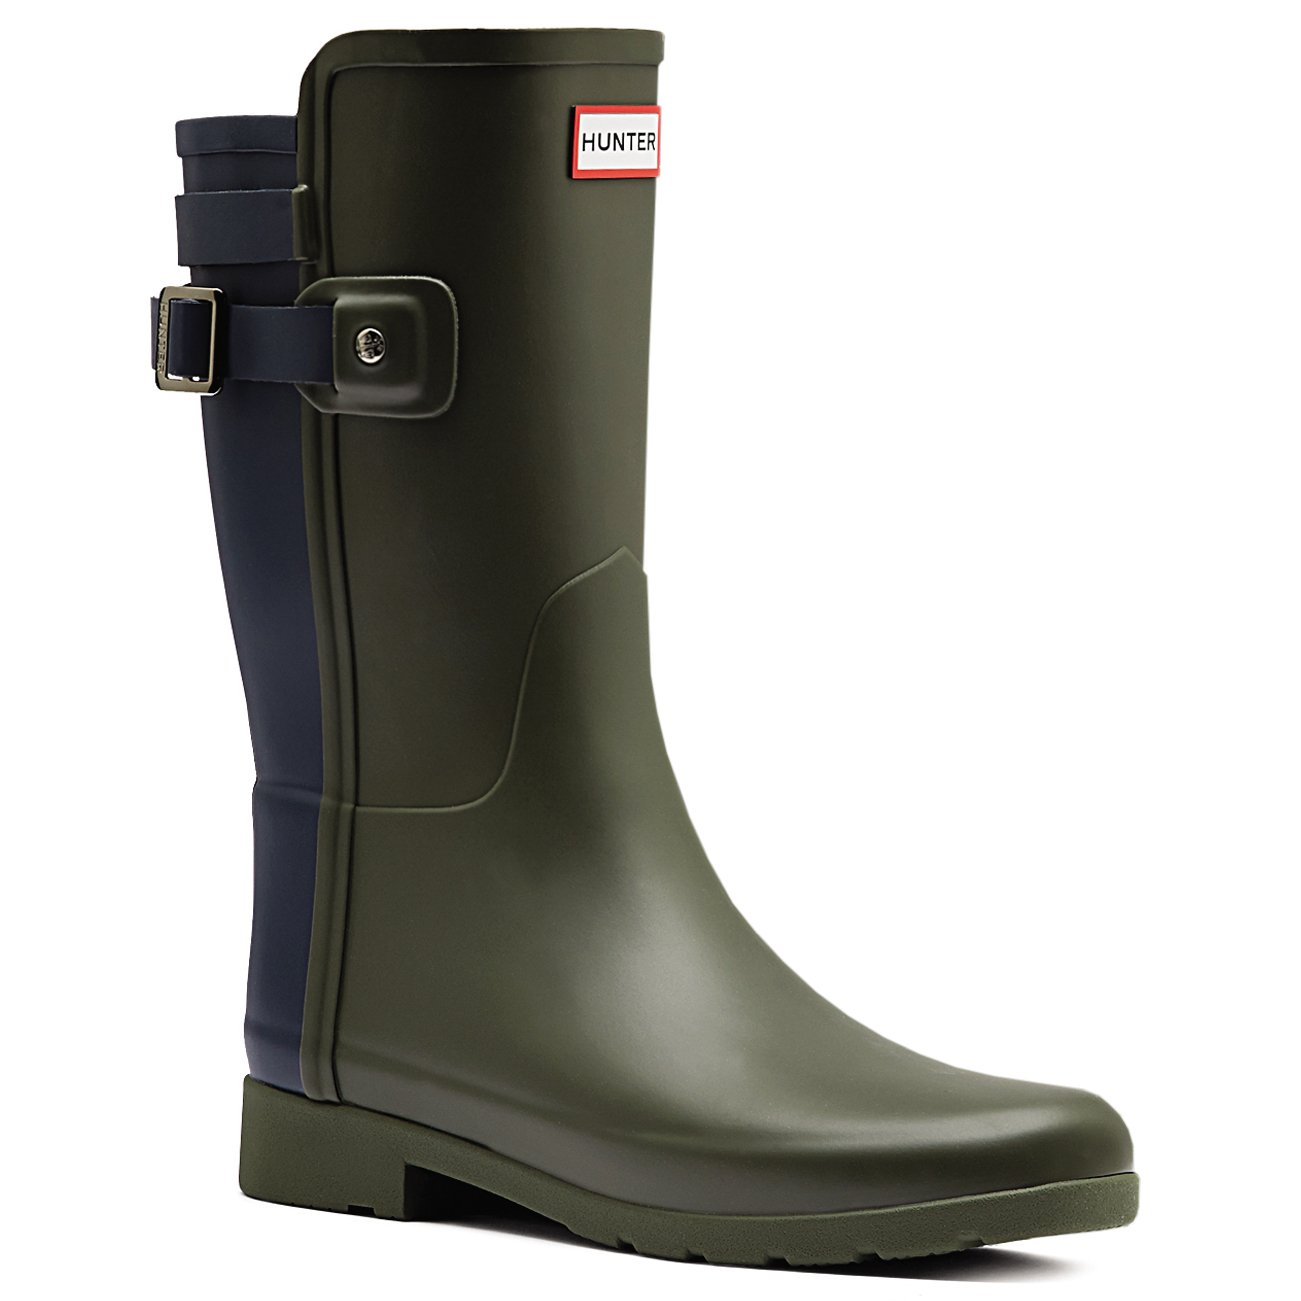 Womens Hunter Original Refined Back Strap Short Wellingtons Rain Boots B01JOU4LJM 5 B(M) US|Dark Olive/Navy